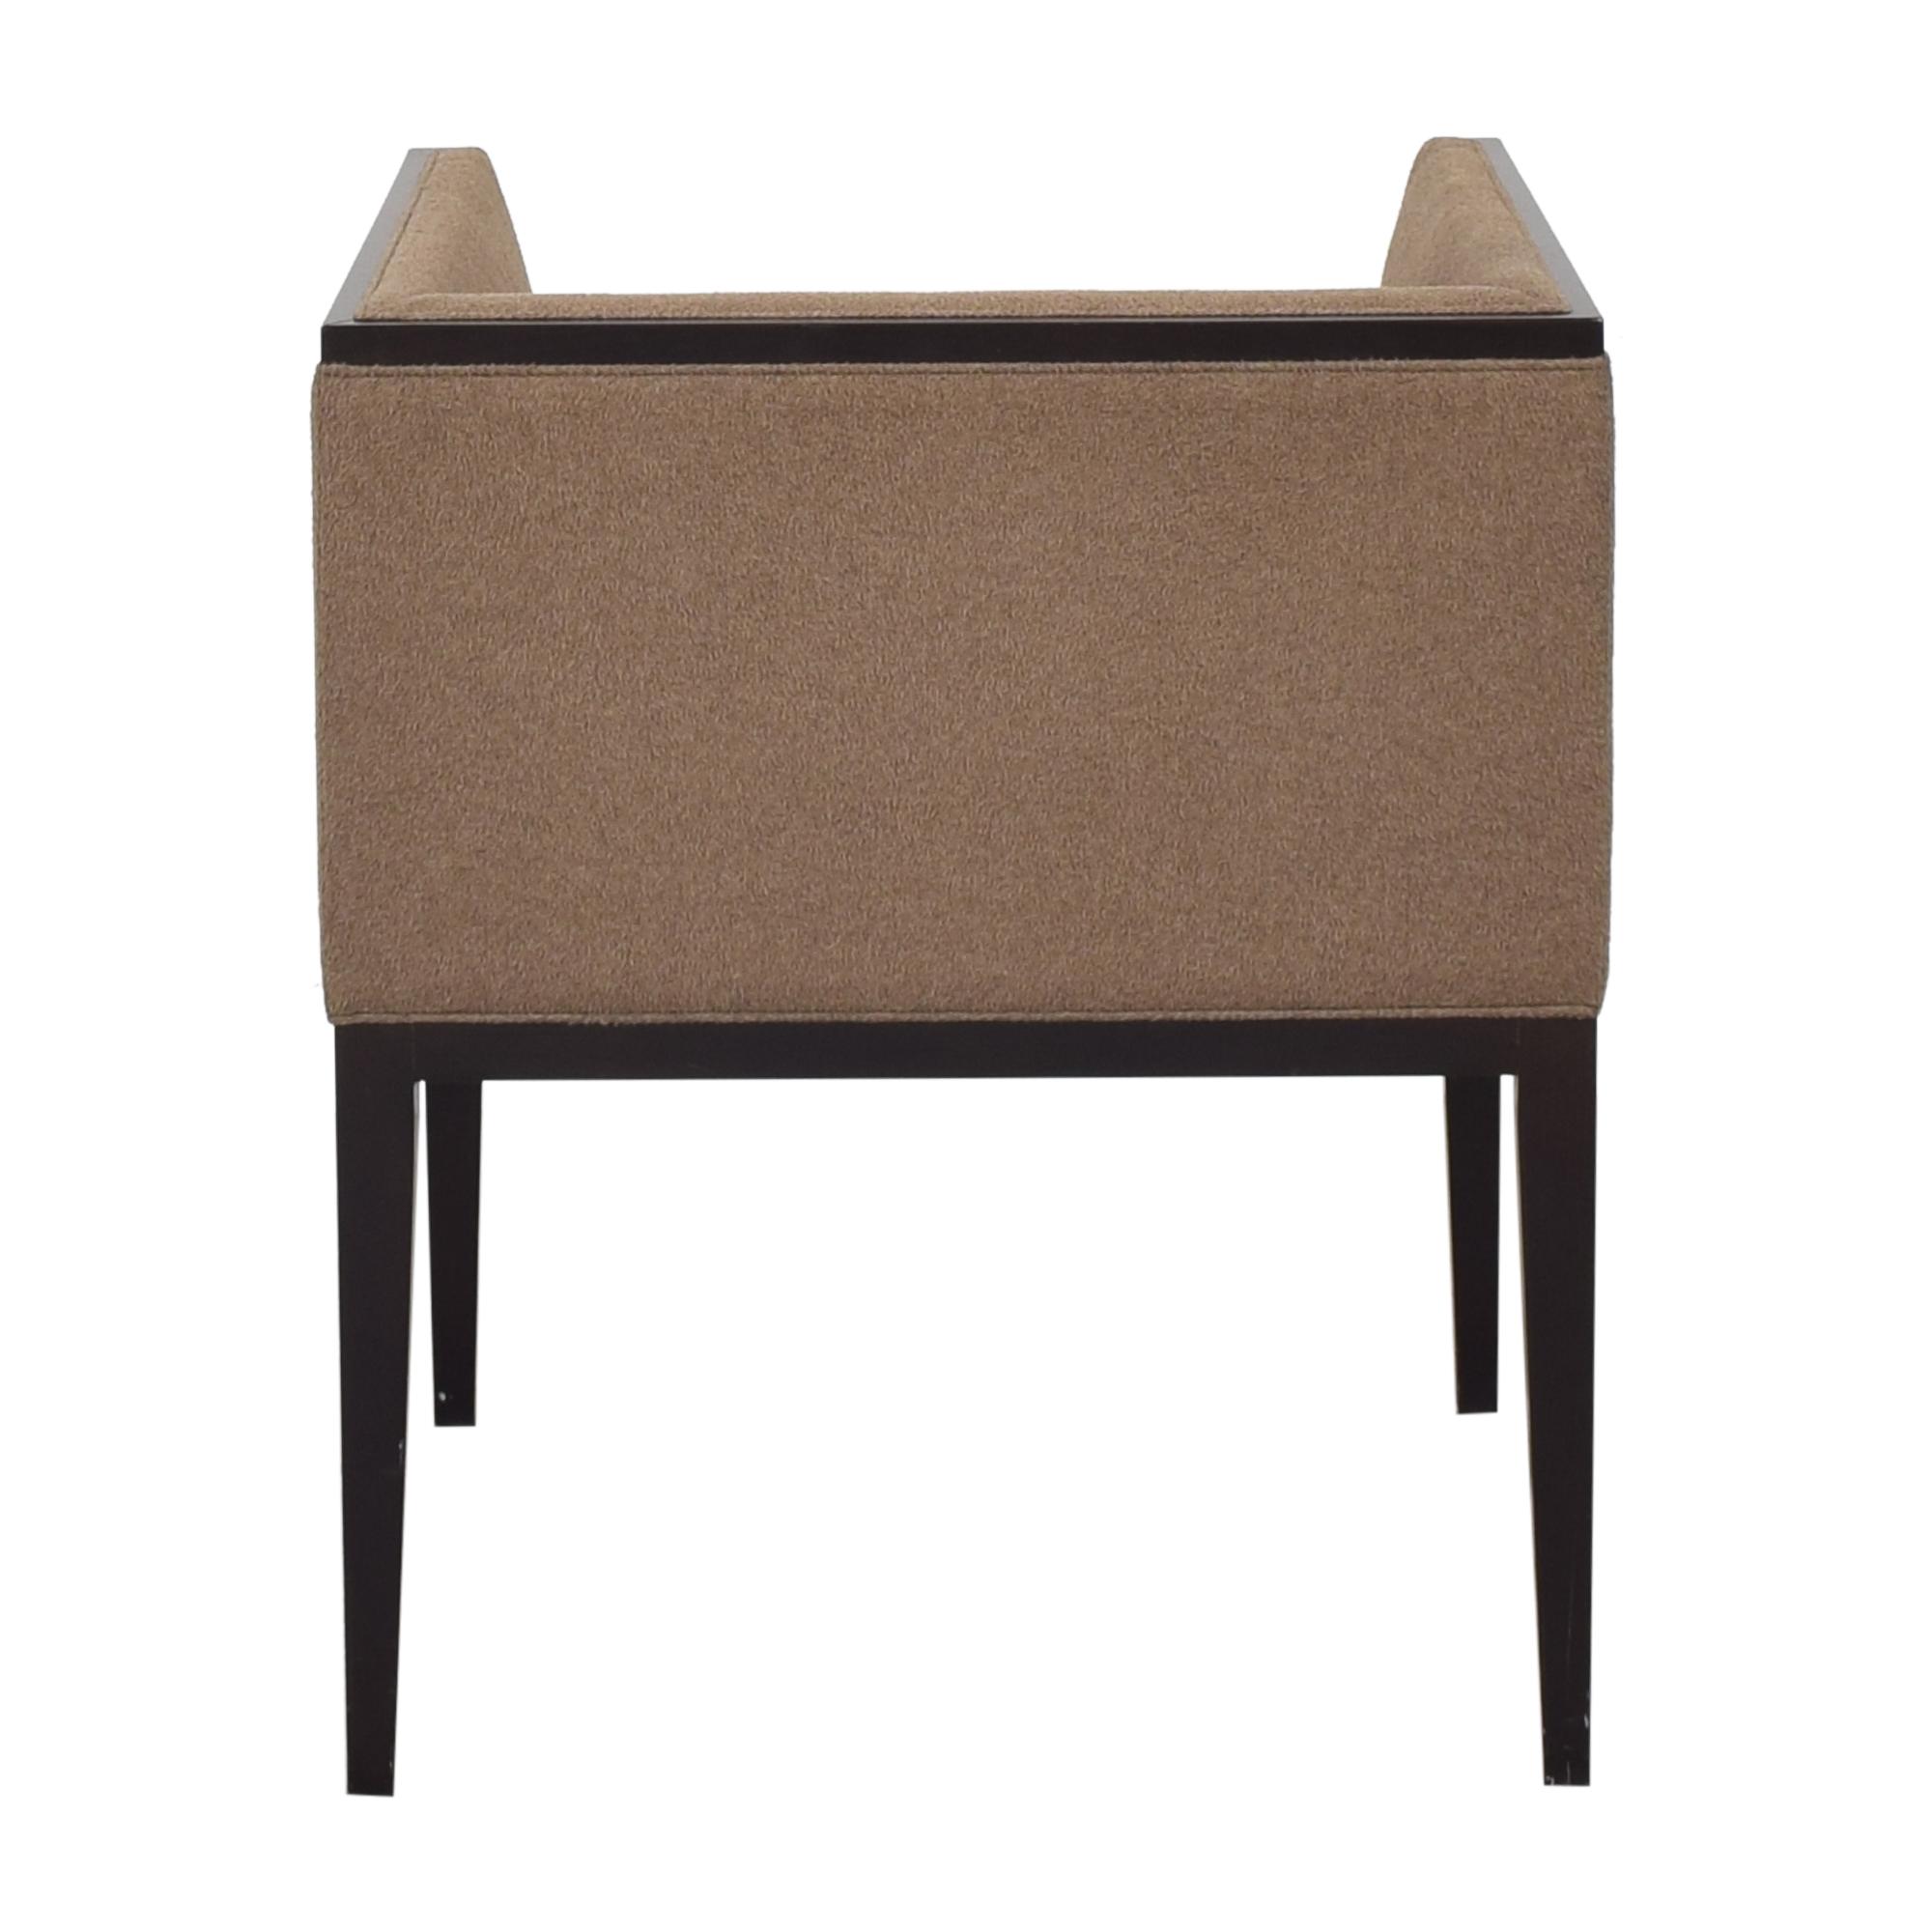 Hudson Furniture & Bedding Tuxedo Accent Chair Hudson Furniture & Bedding